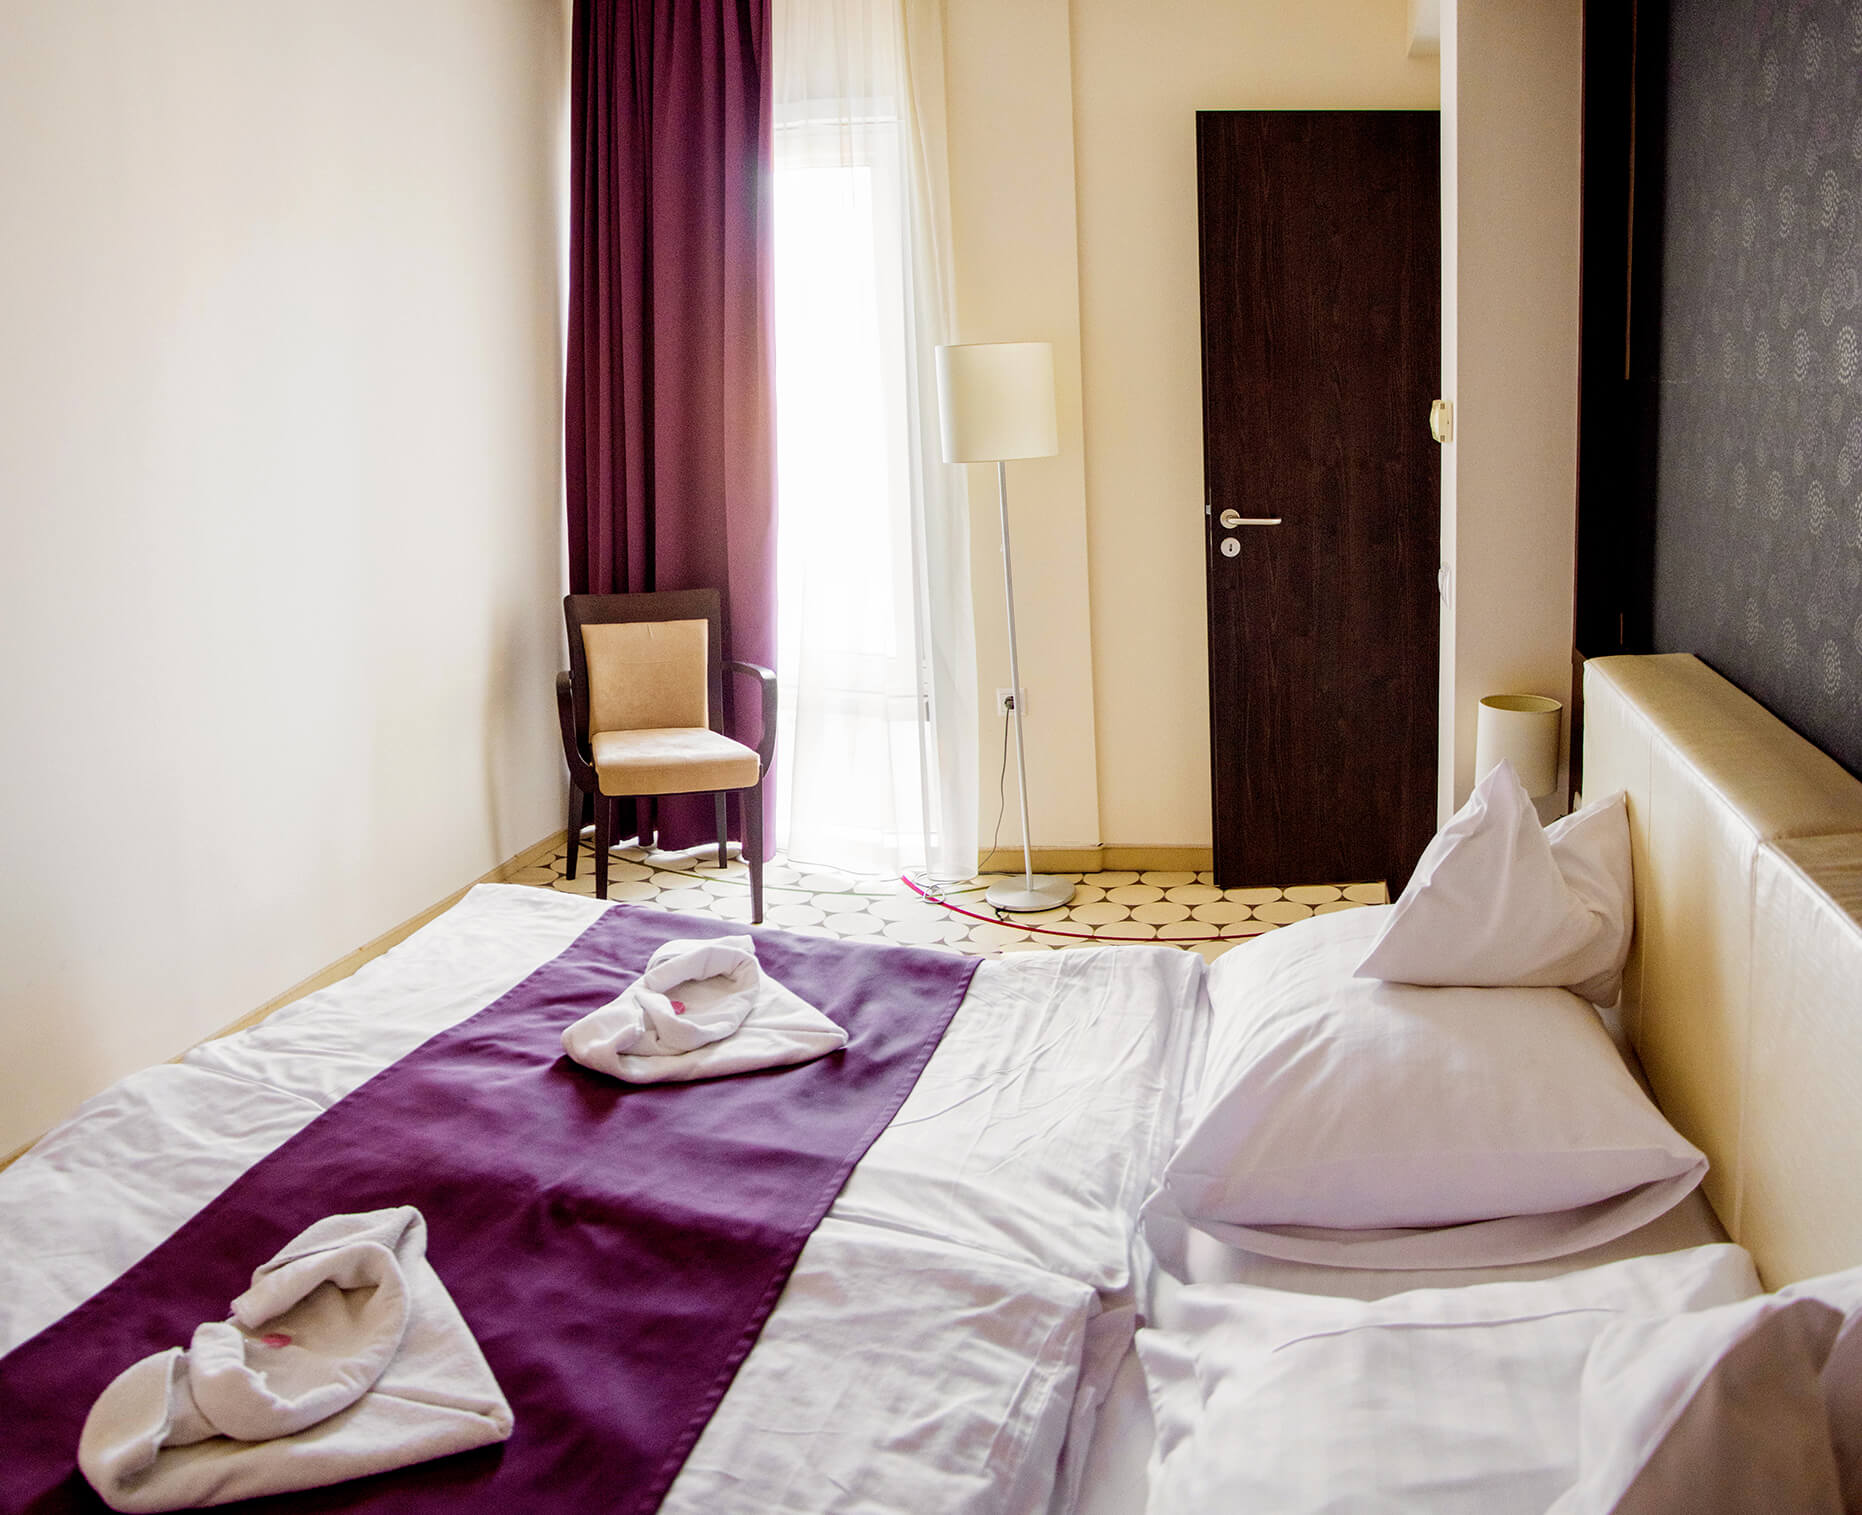 hotel-aurora-szobak12.jpg